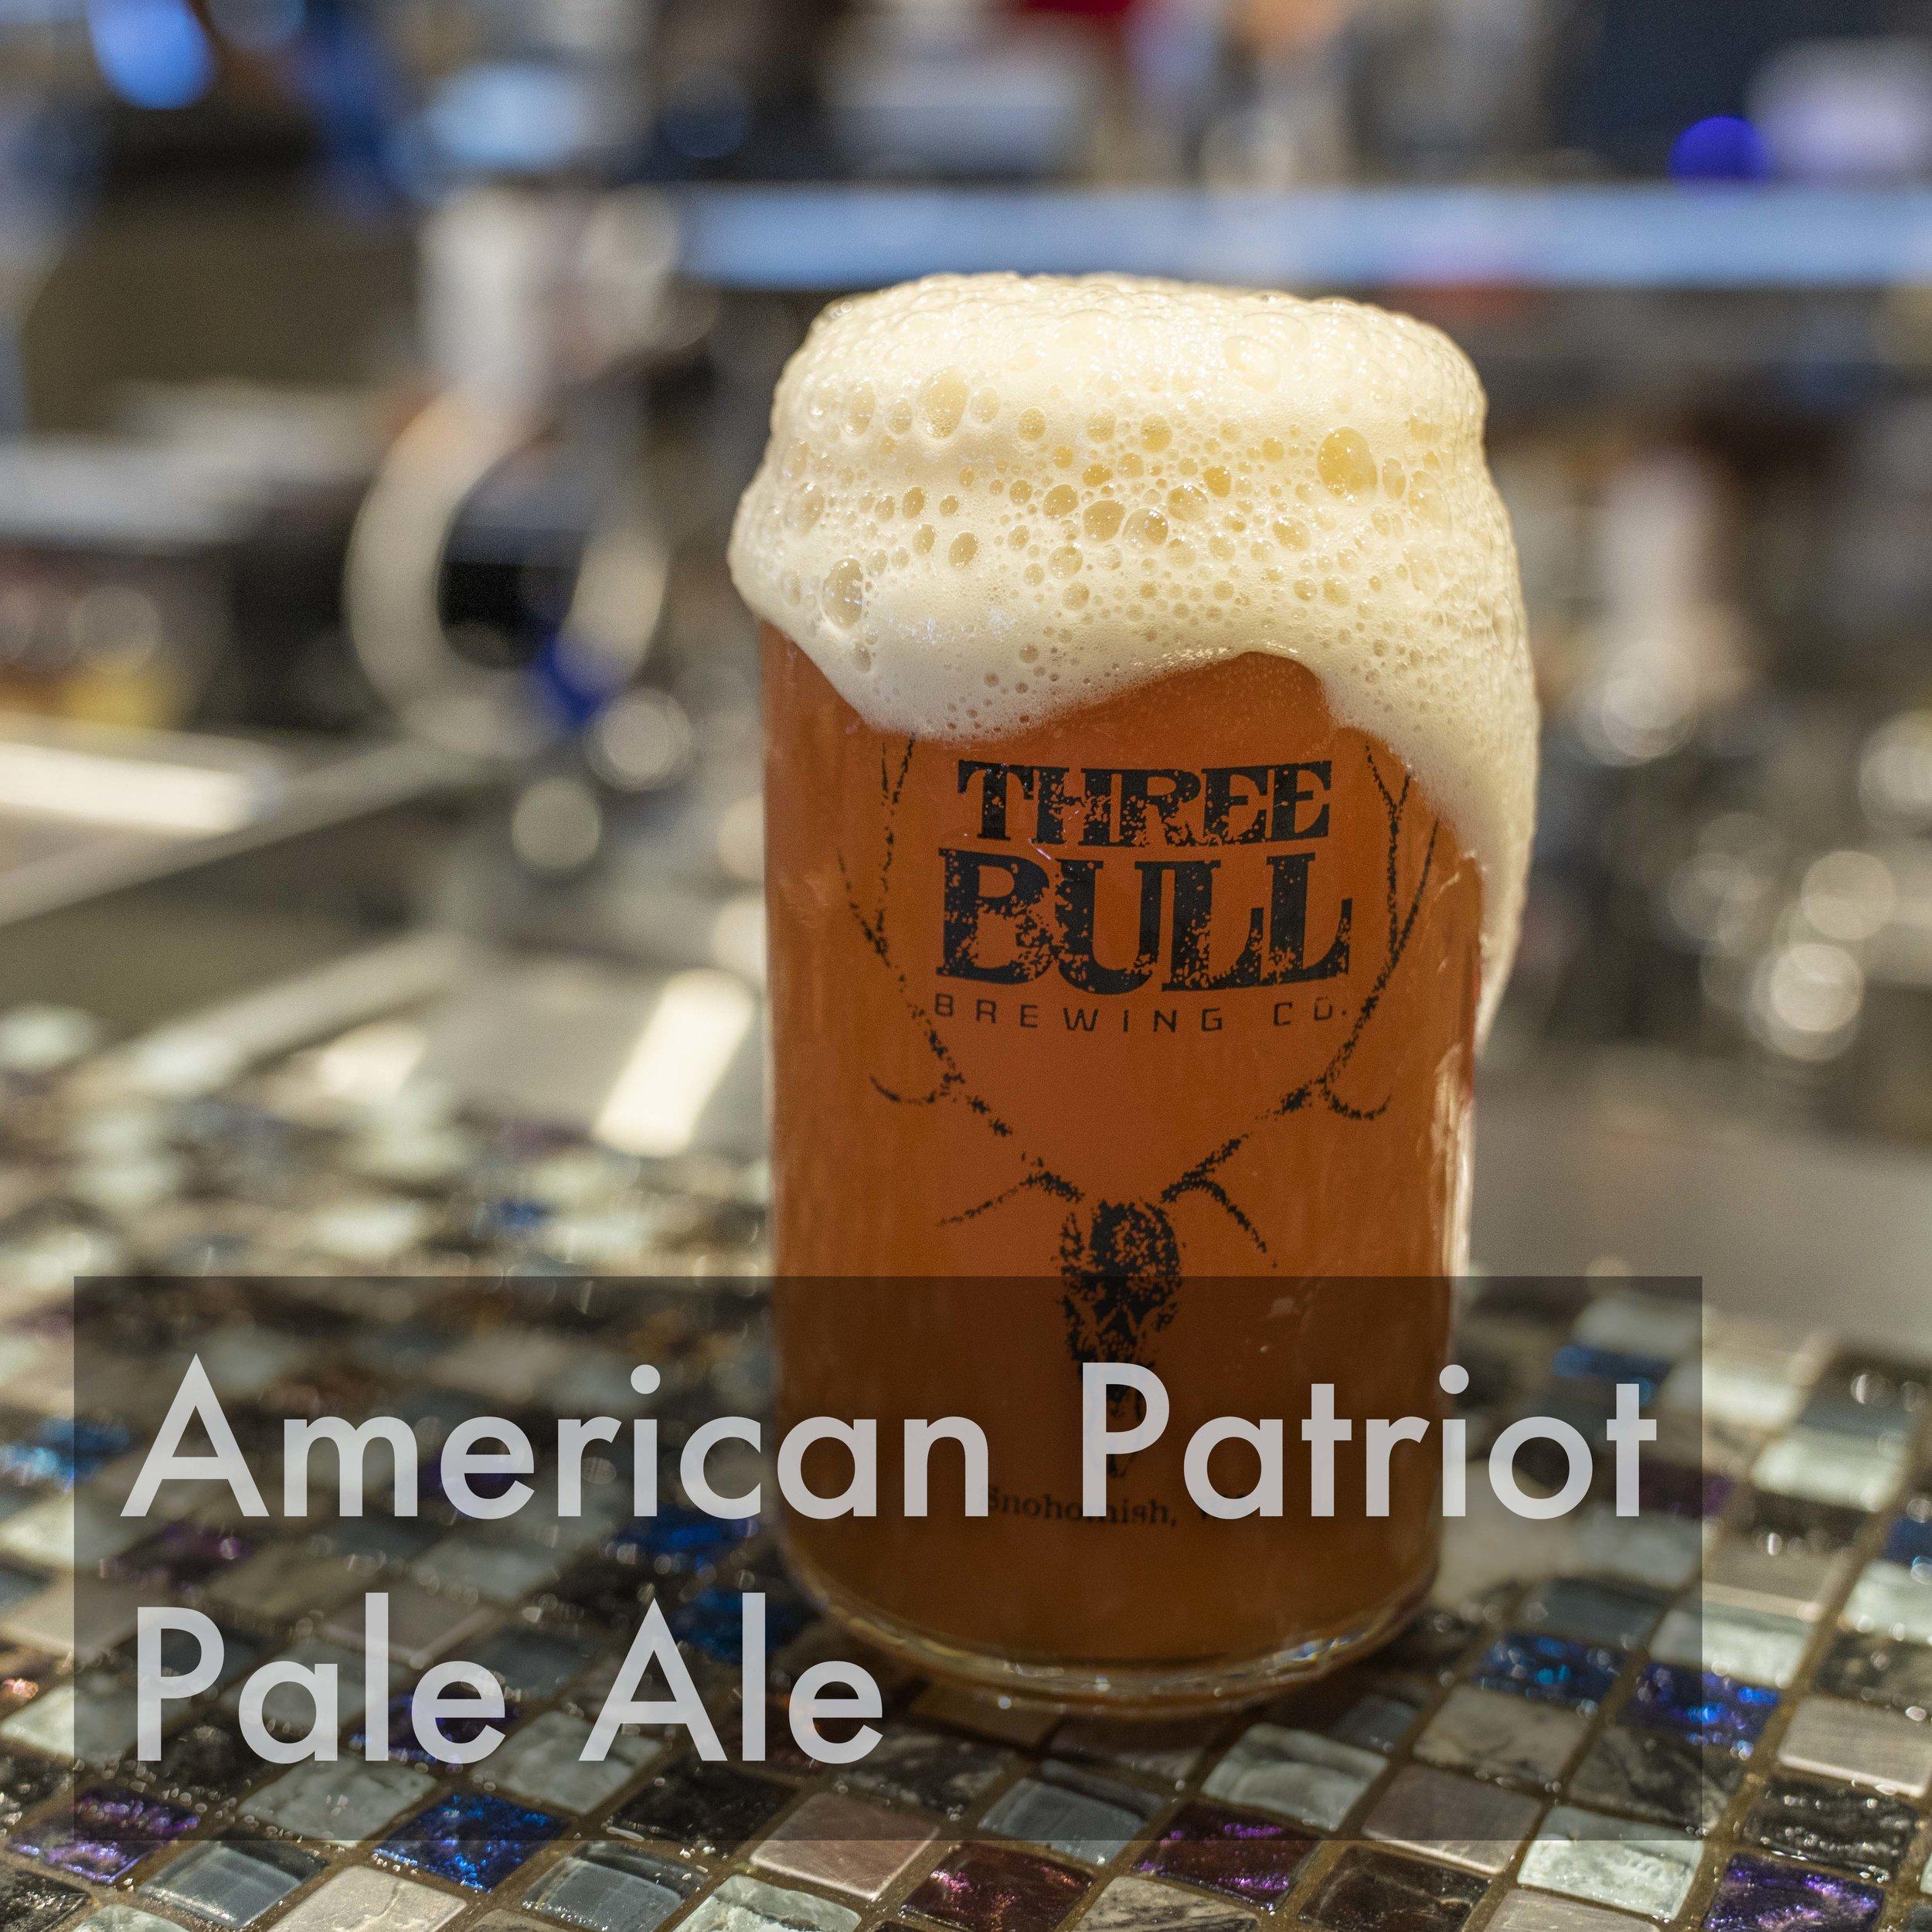 American Patriot Pale Ale Web 2.jpg